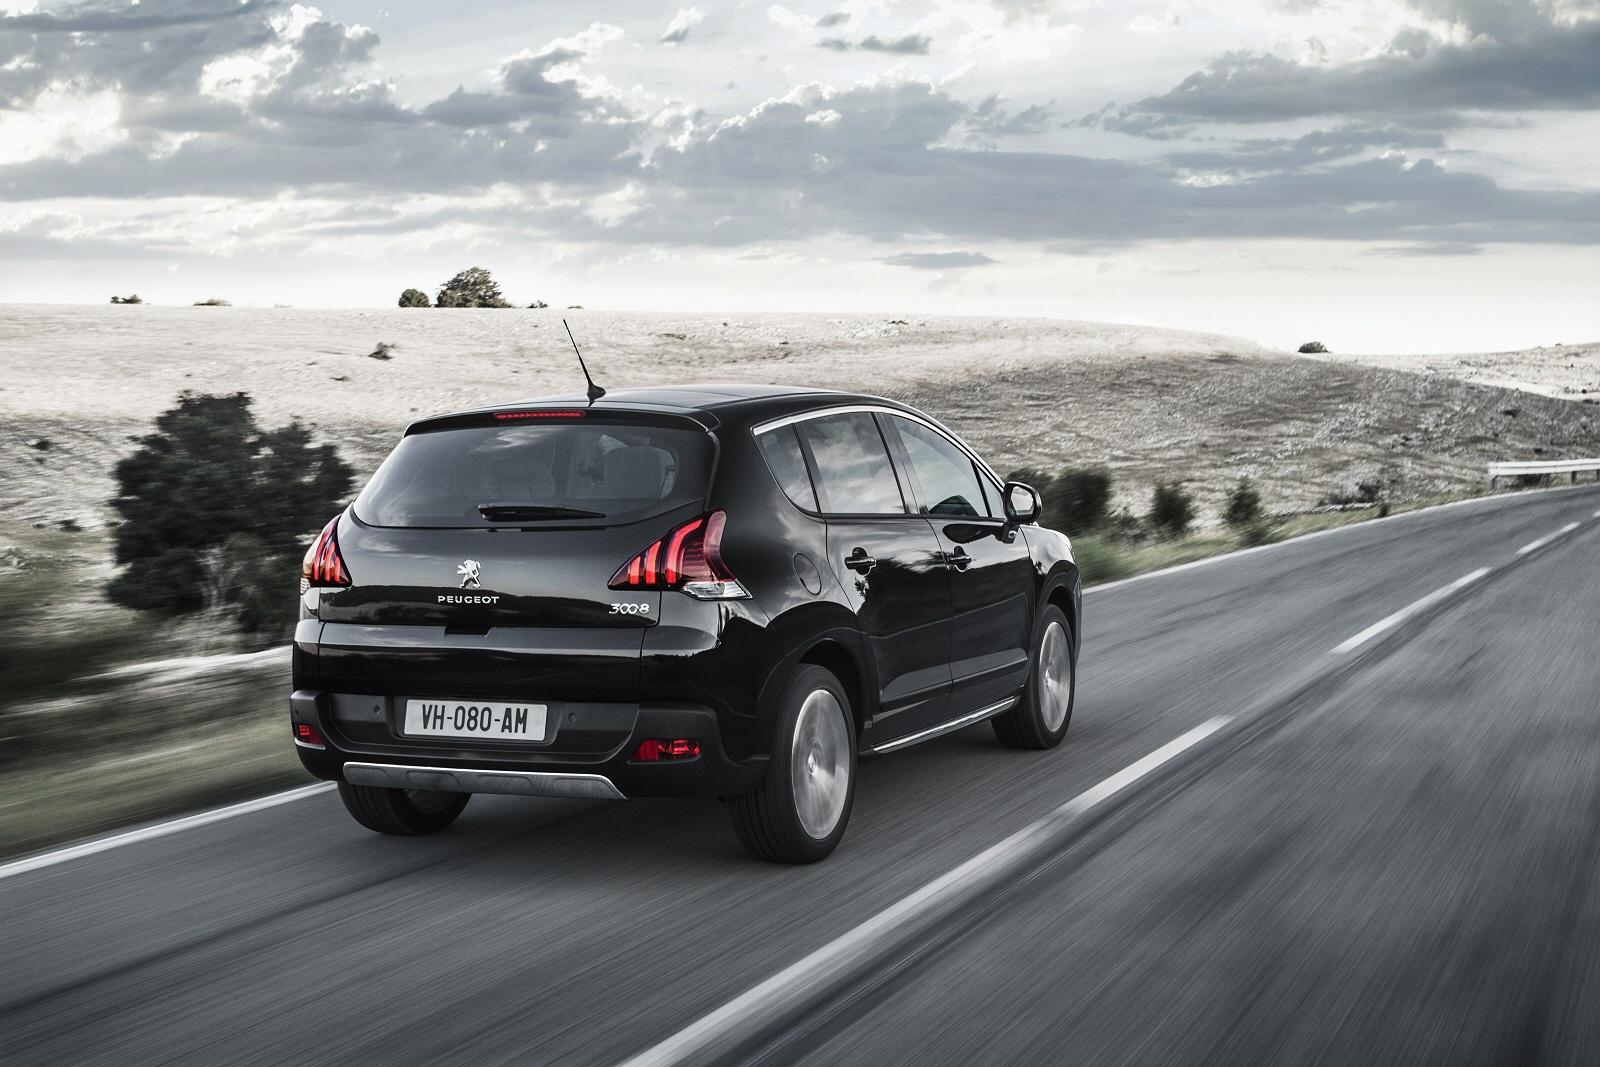 Rear View 2014 Peugeot 3008